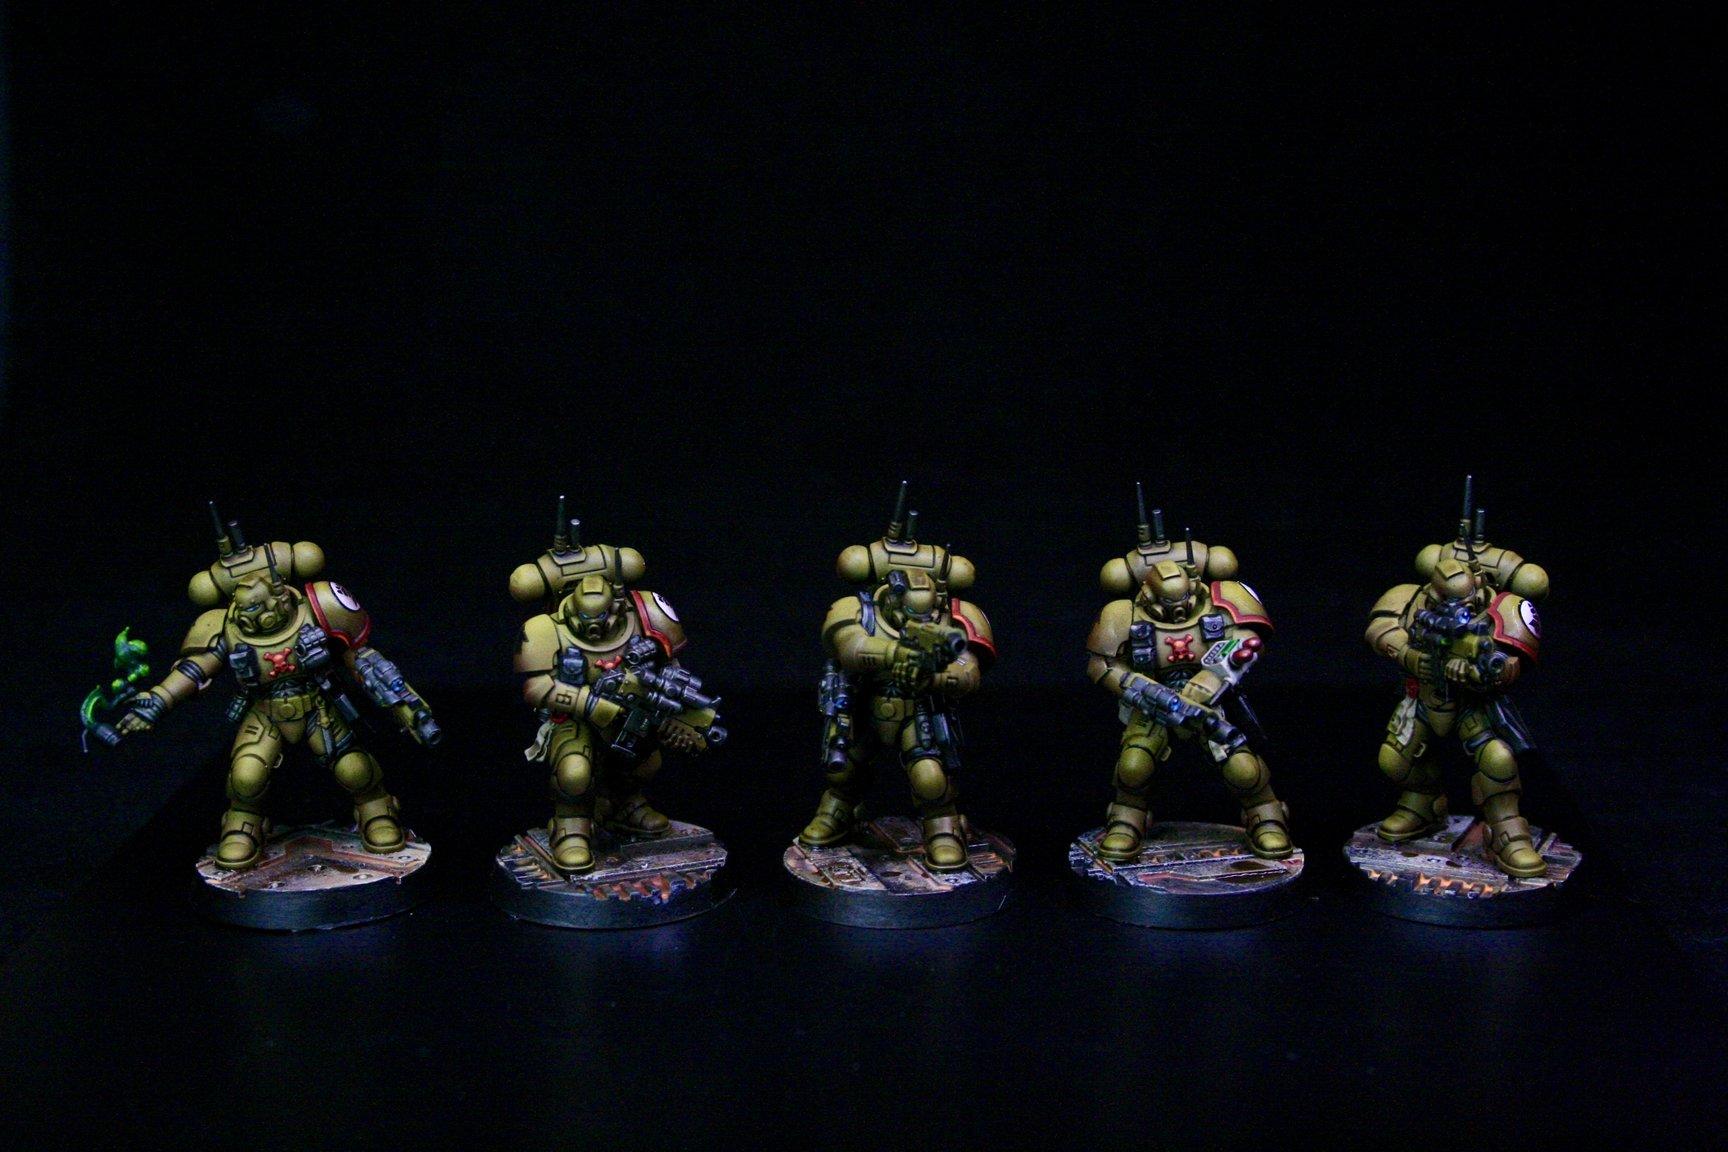 Imperial Fists Primaris Infiltrators